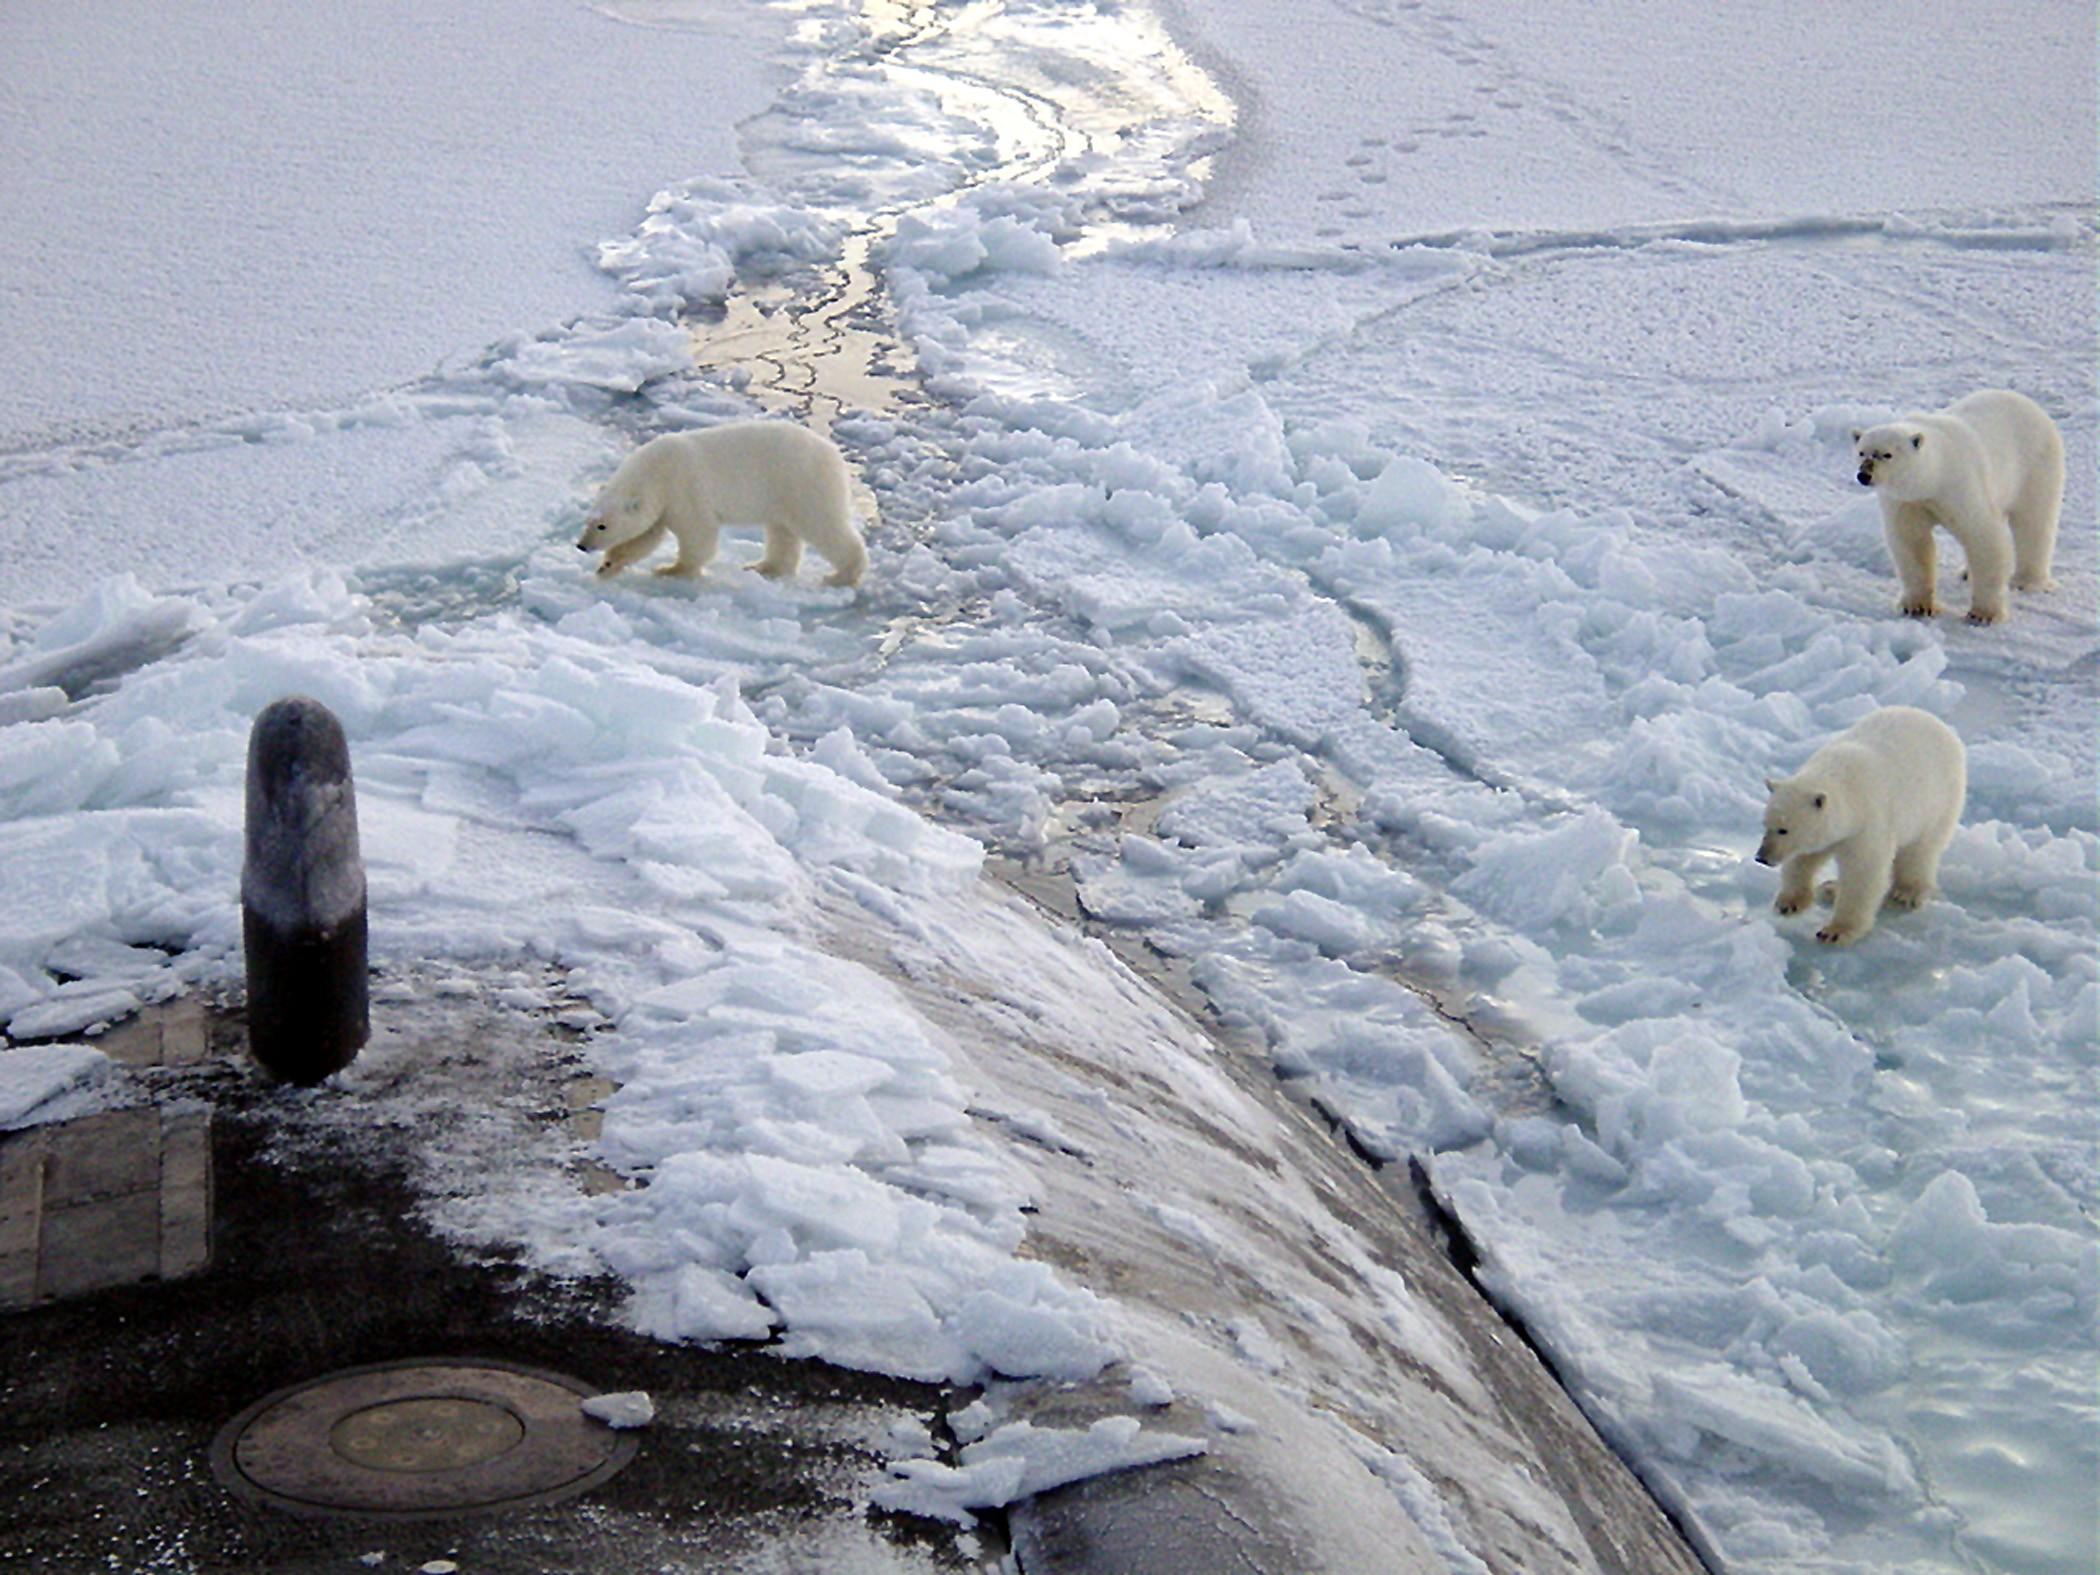 Ursos polares no Ártico (Foto: Wikimedia Commons )